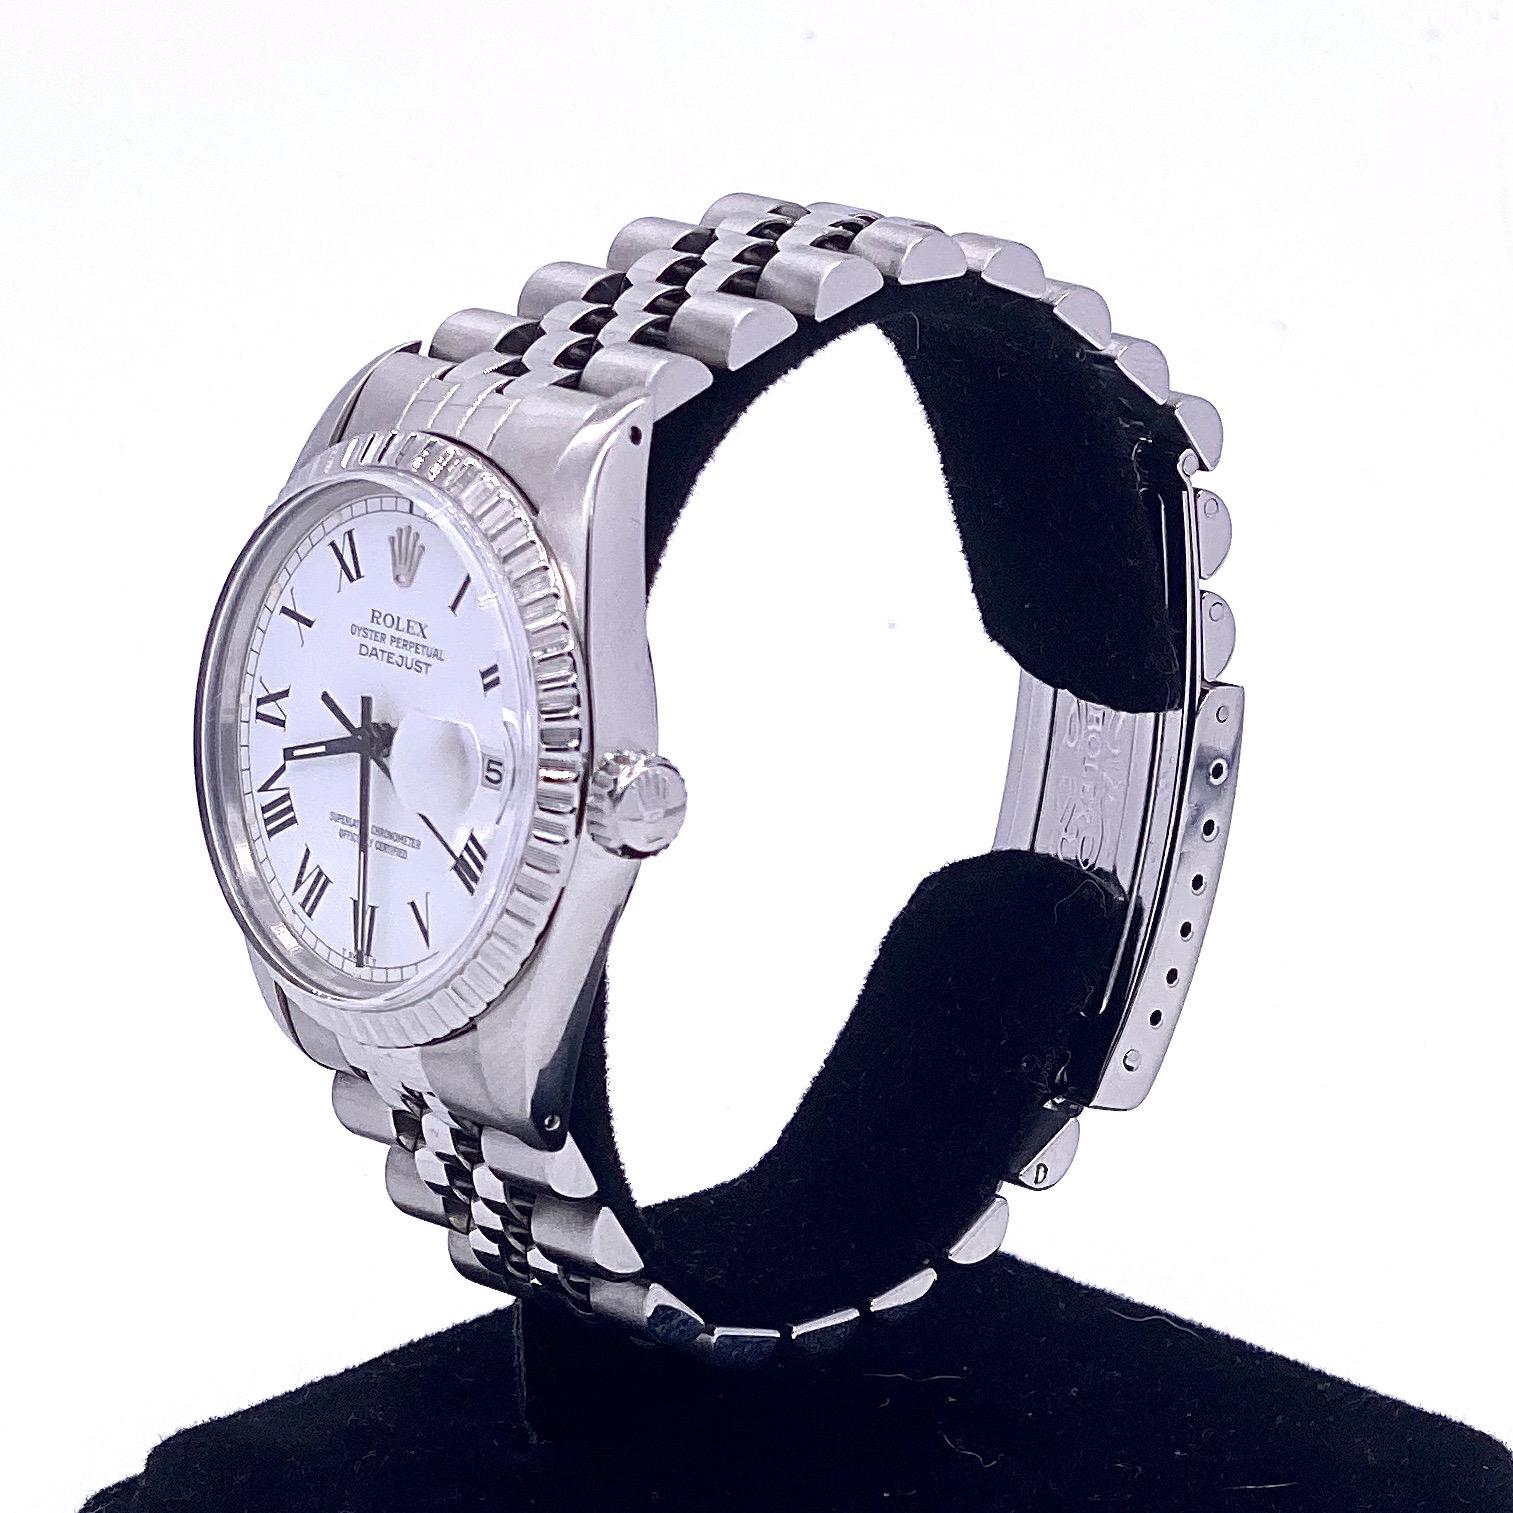 Lot 30 - Rolex Datejust Buckley ref 16030